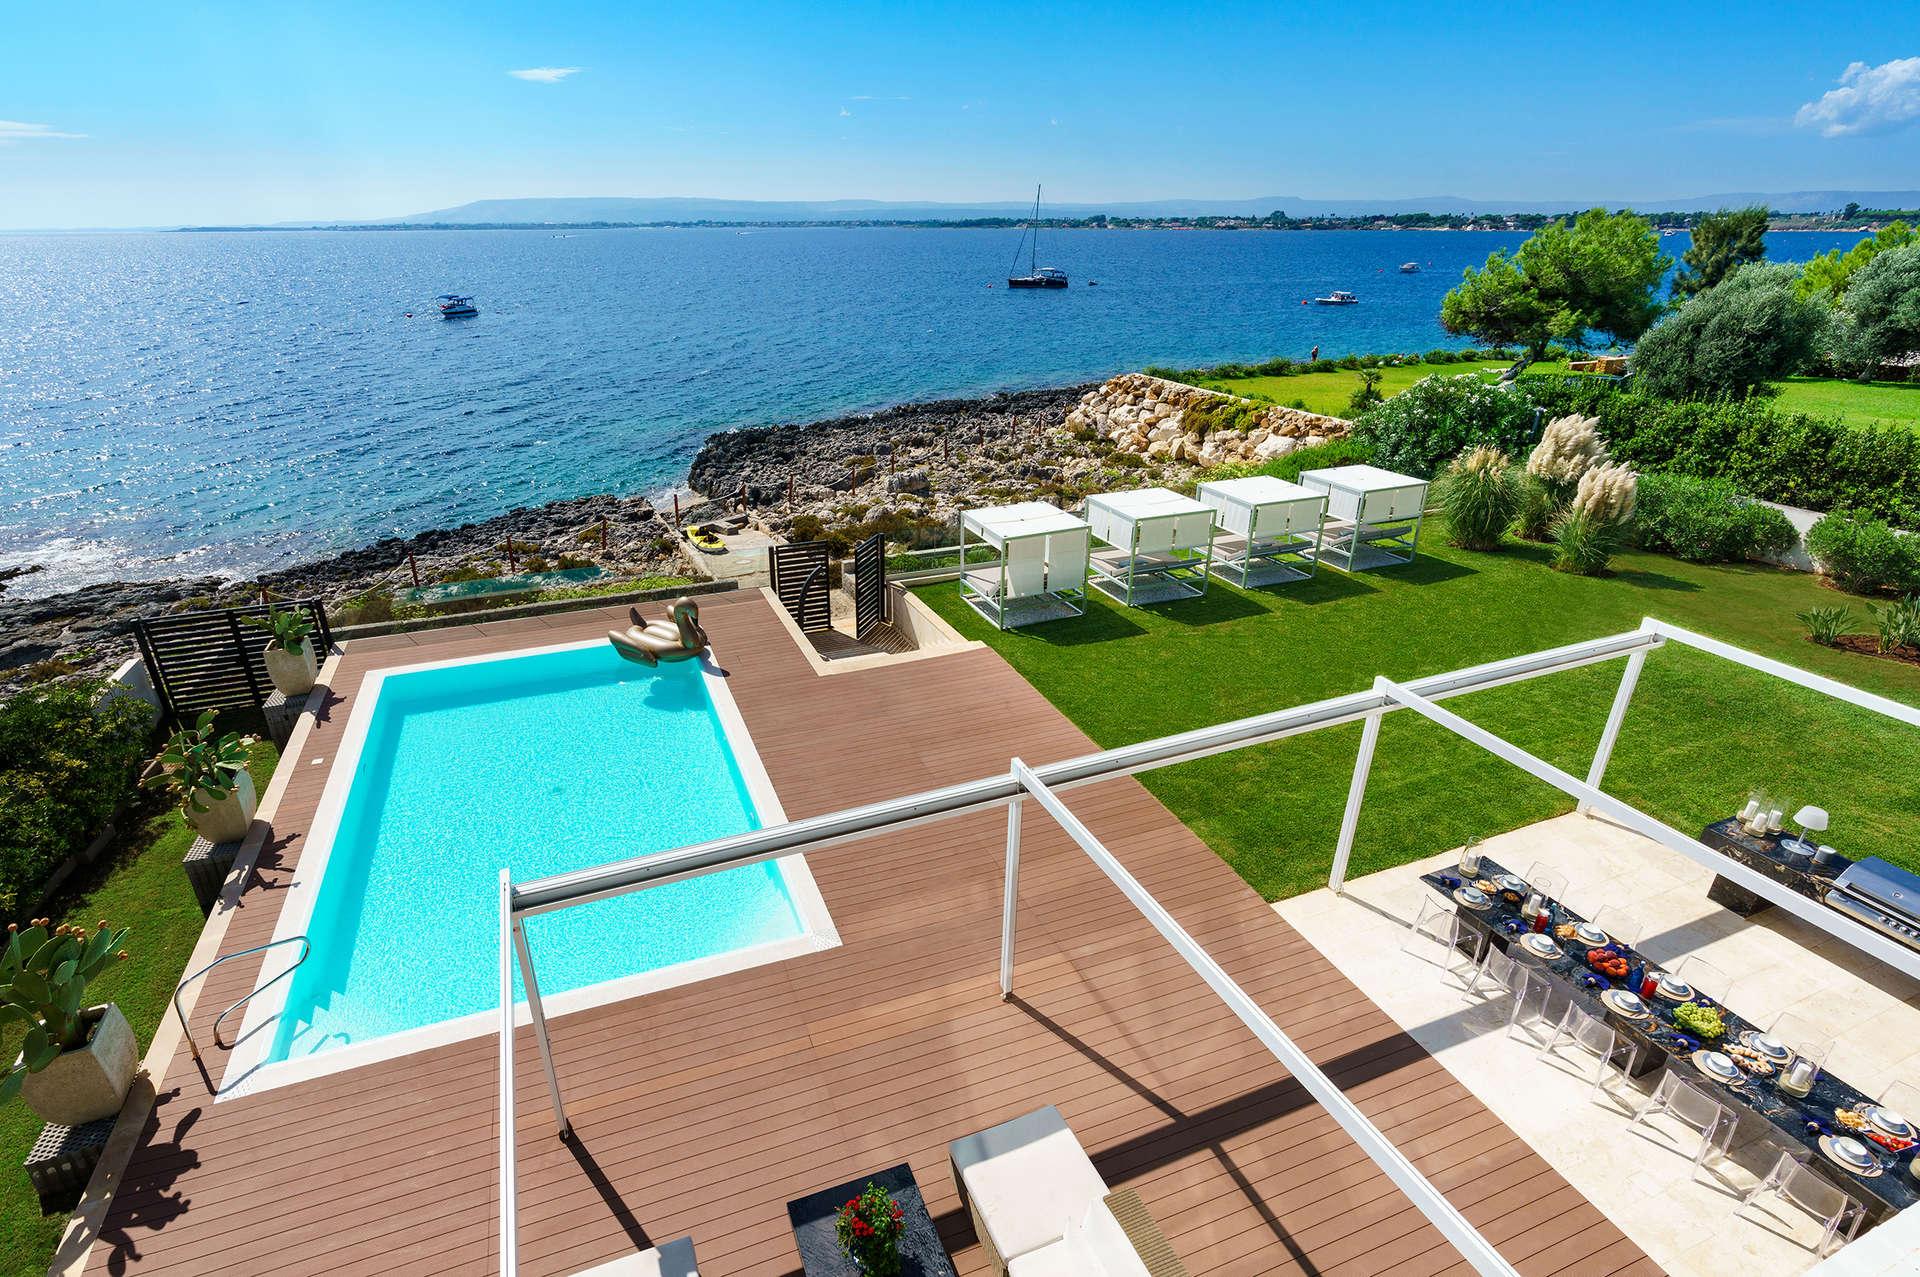 Luxury vacation rentals europe - Italy - Sicily - Siracusa - Villa Angelina - Image 1/24